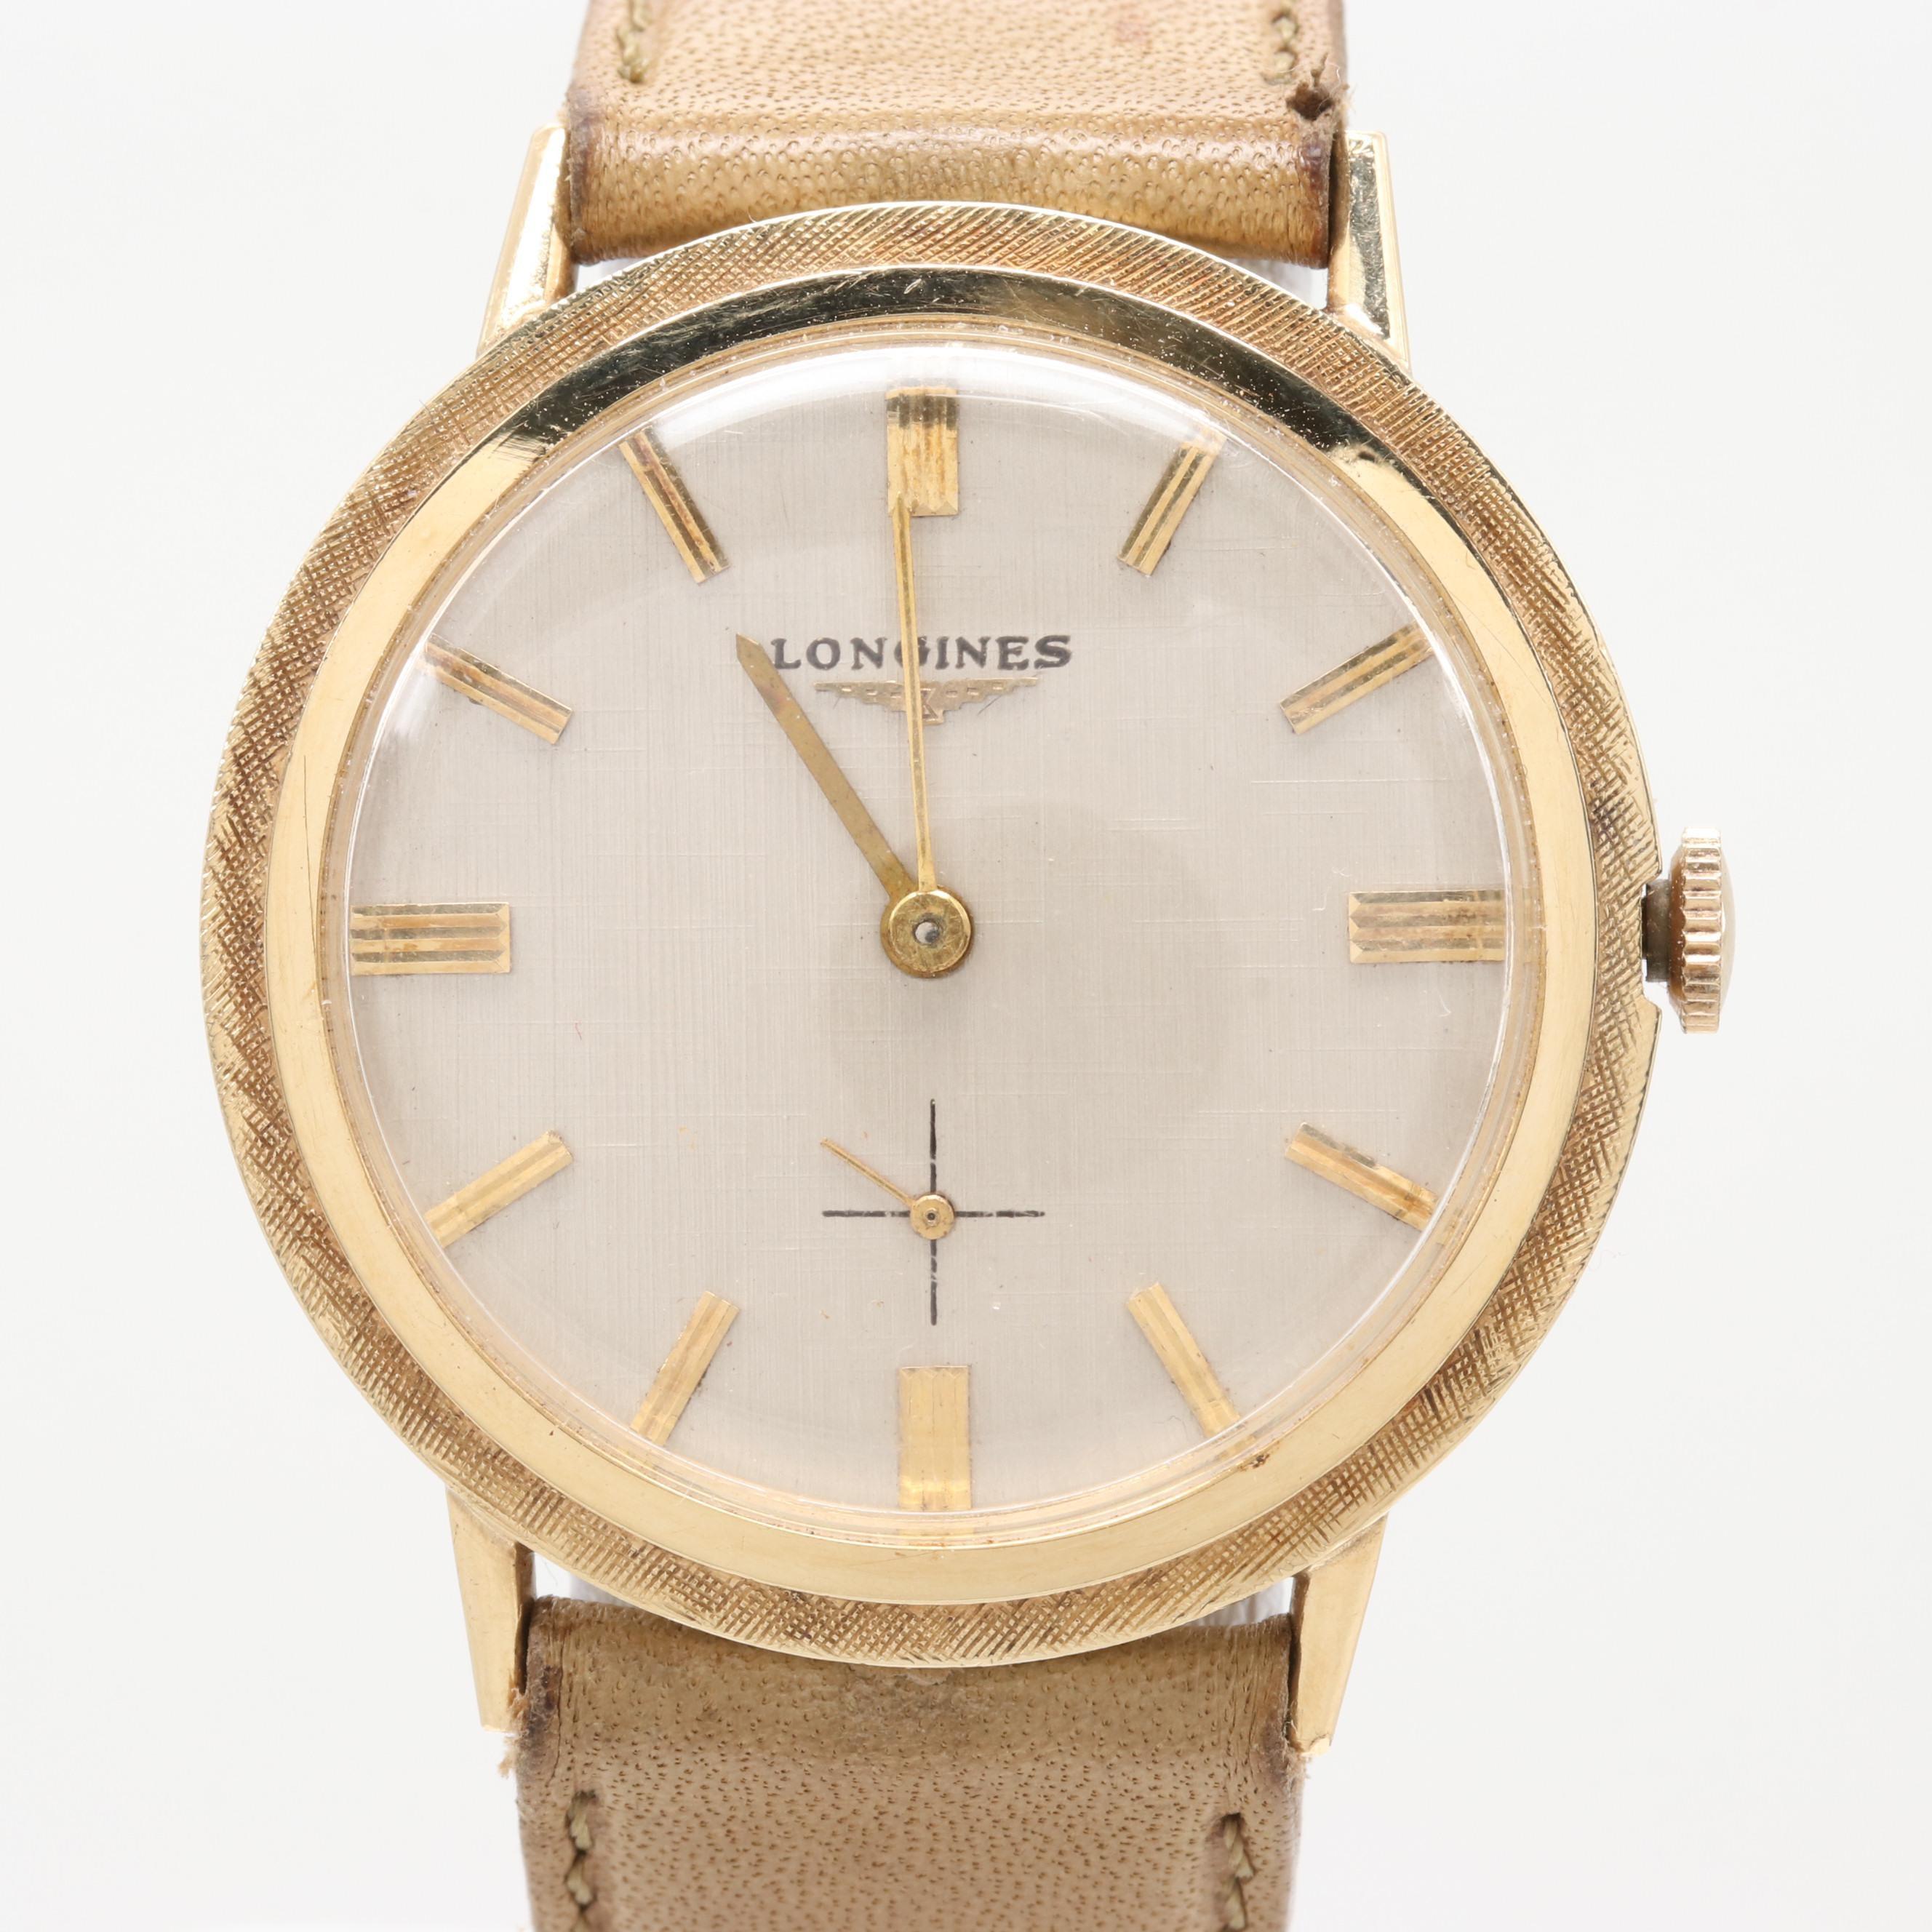 Longines 14K Yellow Gold Wristwatch